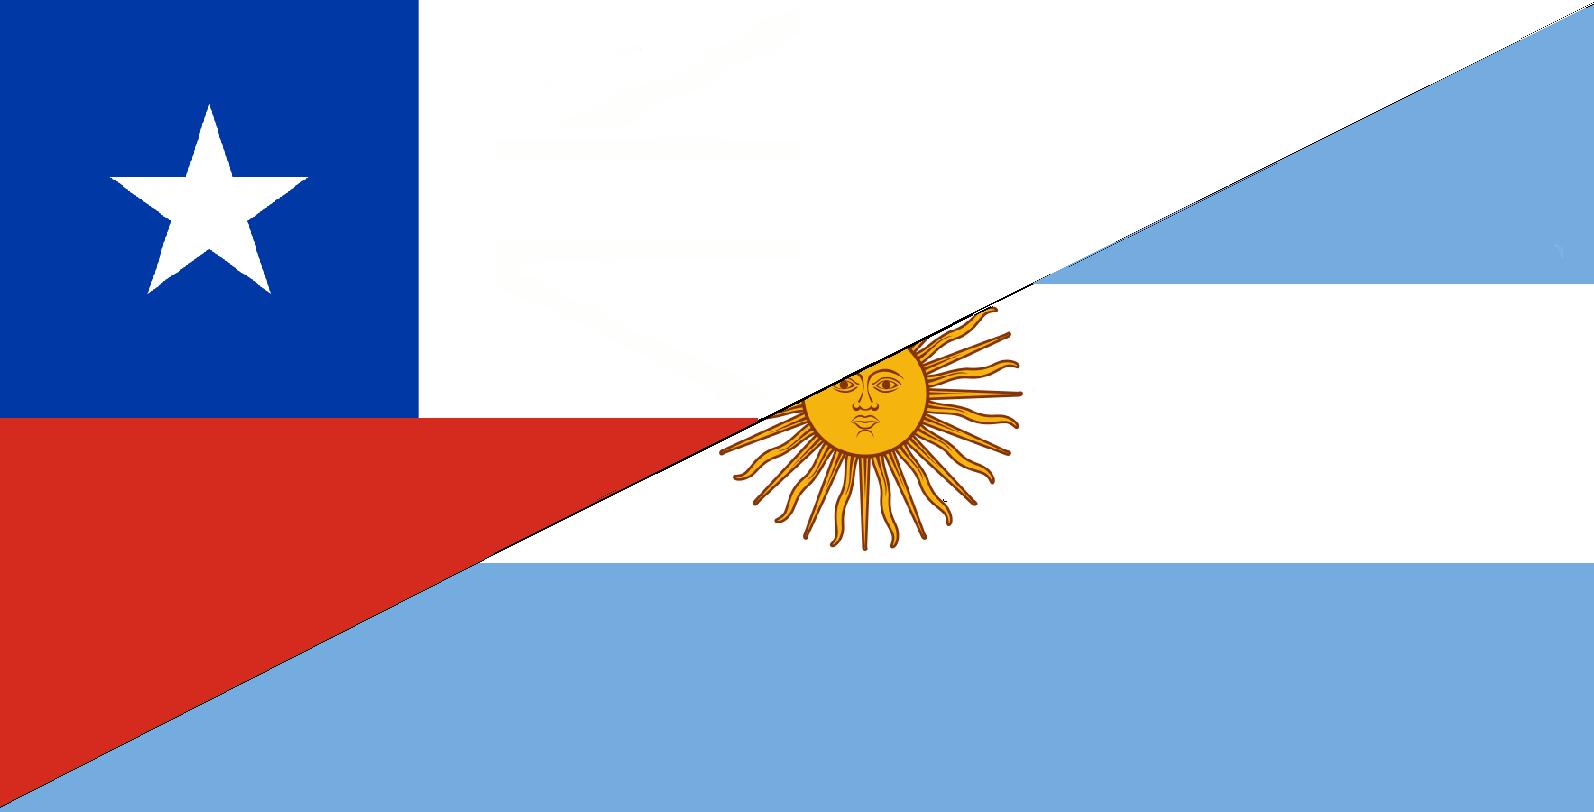 Viva Chile¡